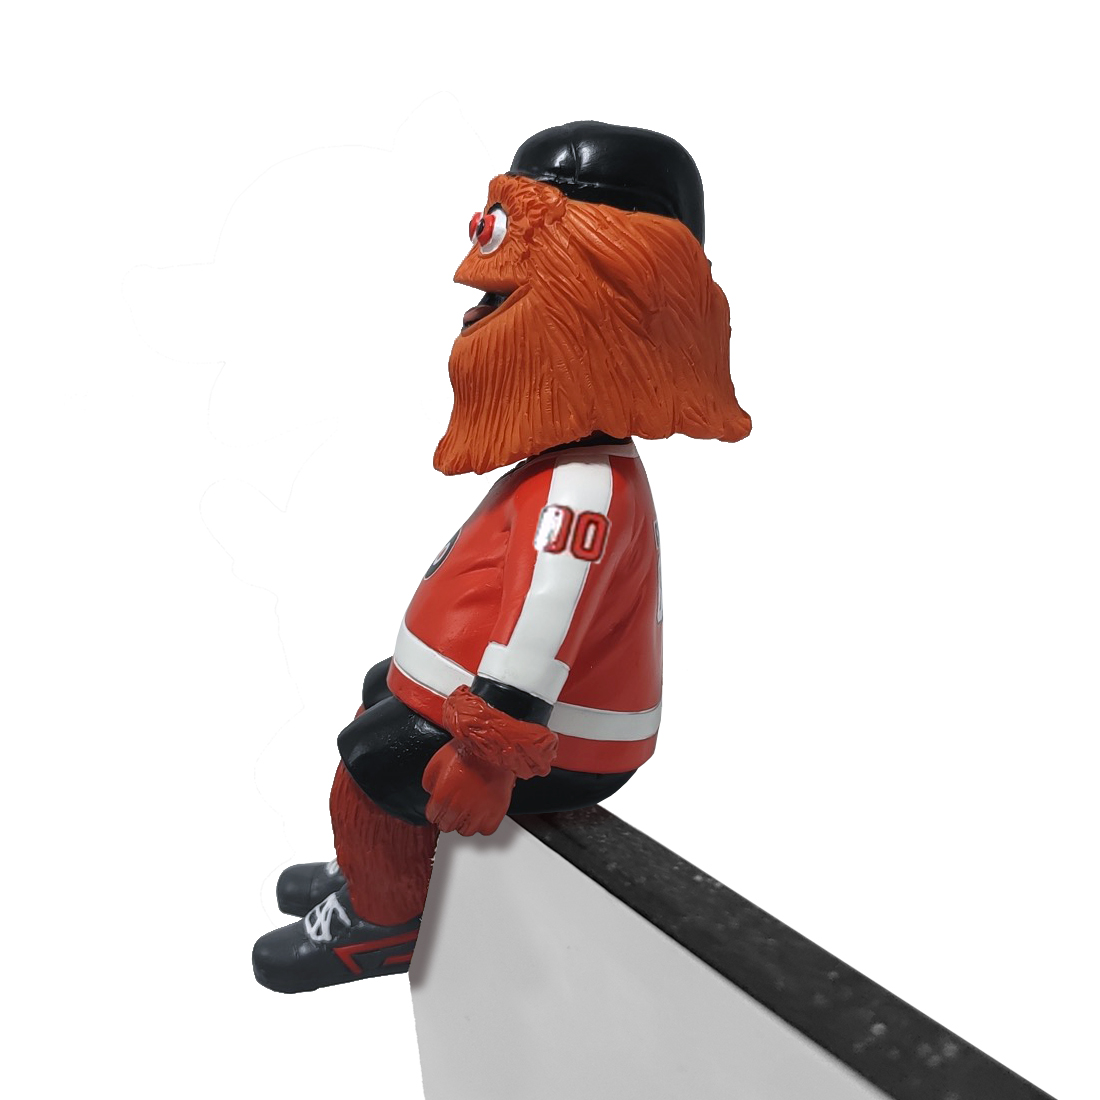 Philadelphia Flyers Gritty Bobble Buddy Gallery